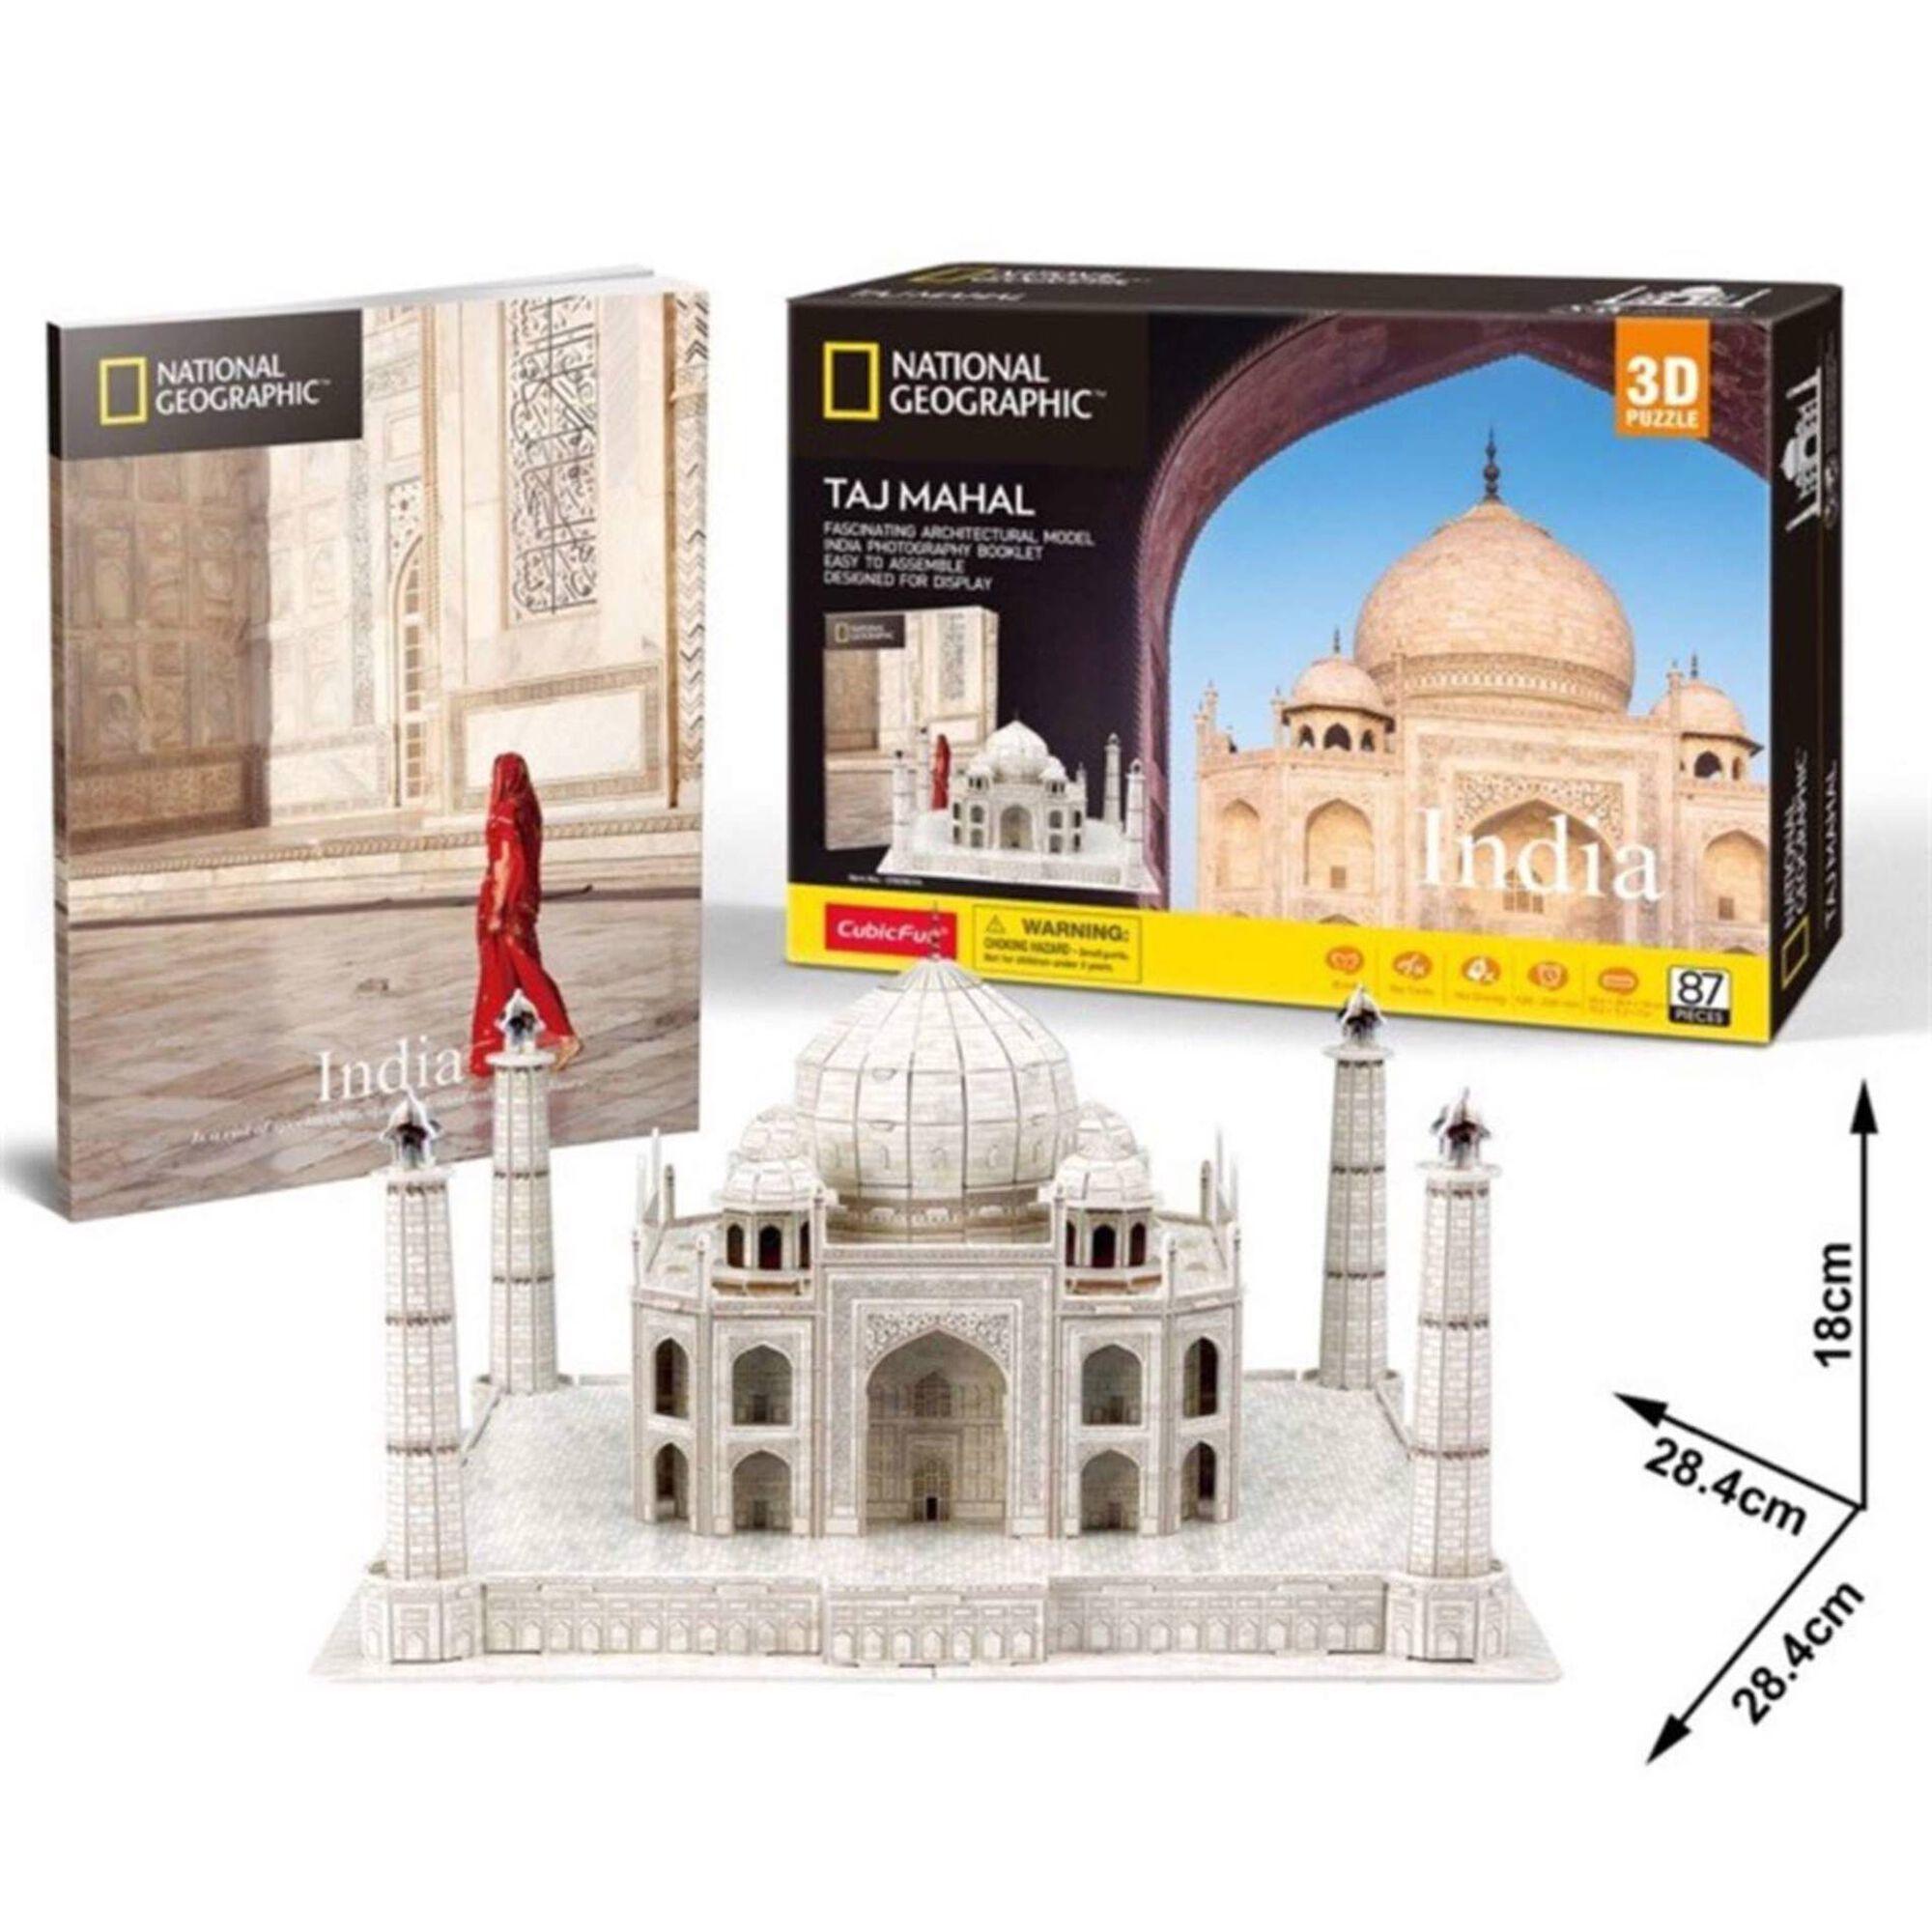 Puzzle 3D Taj Mahal 86 Peças